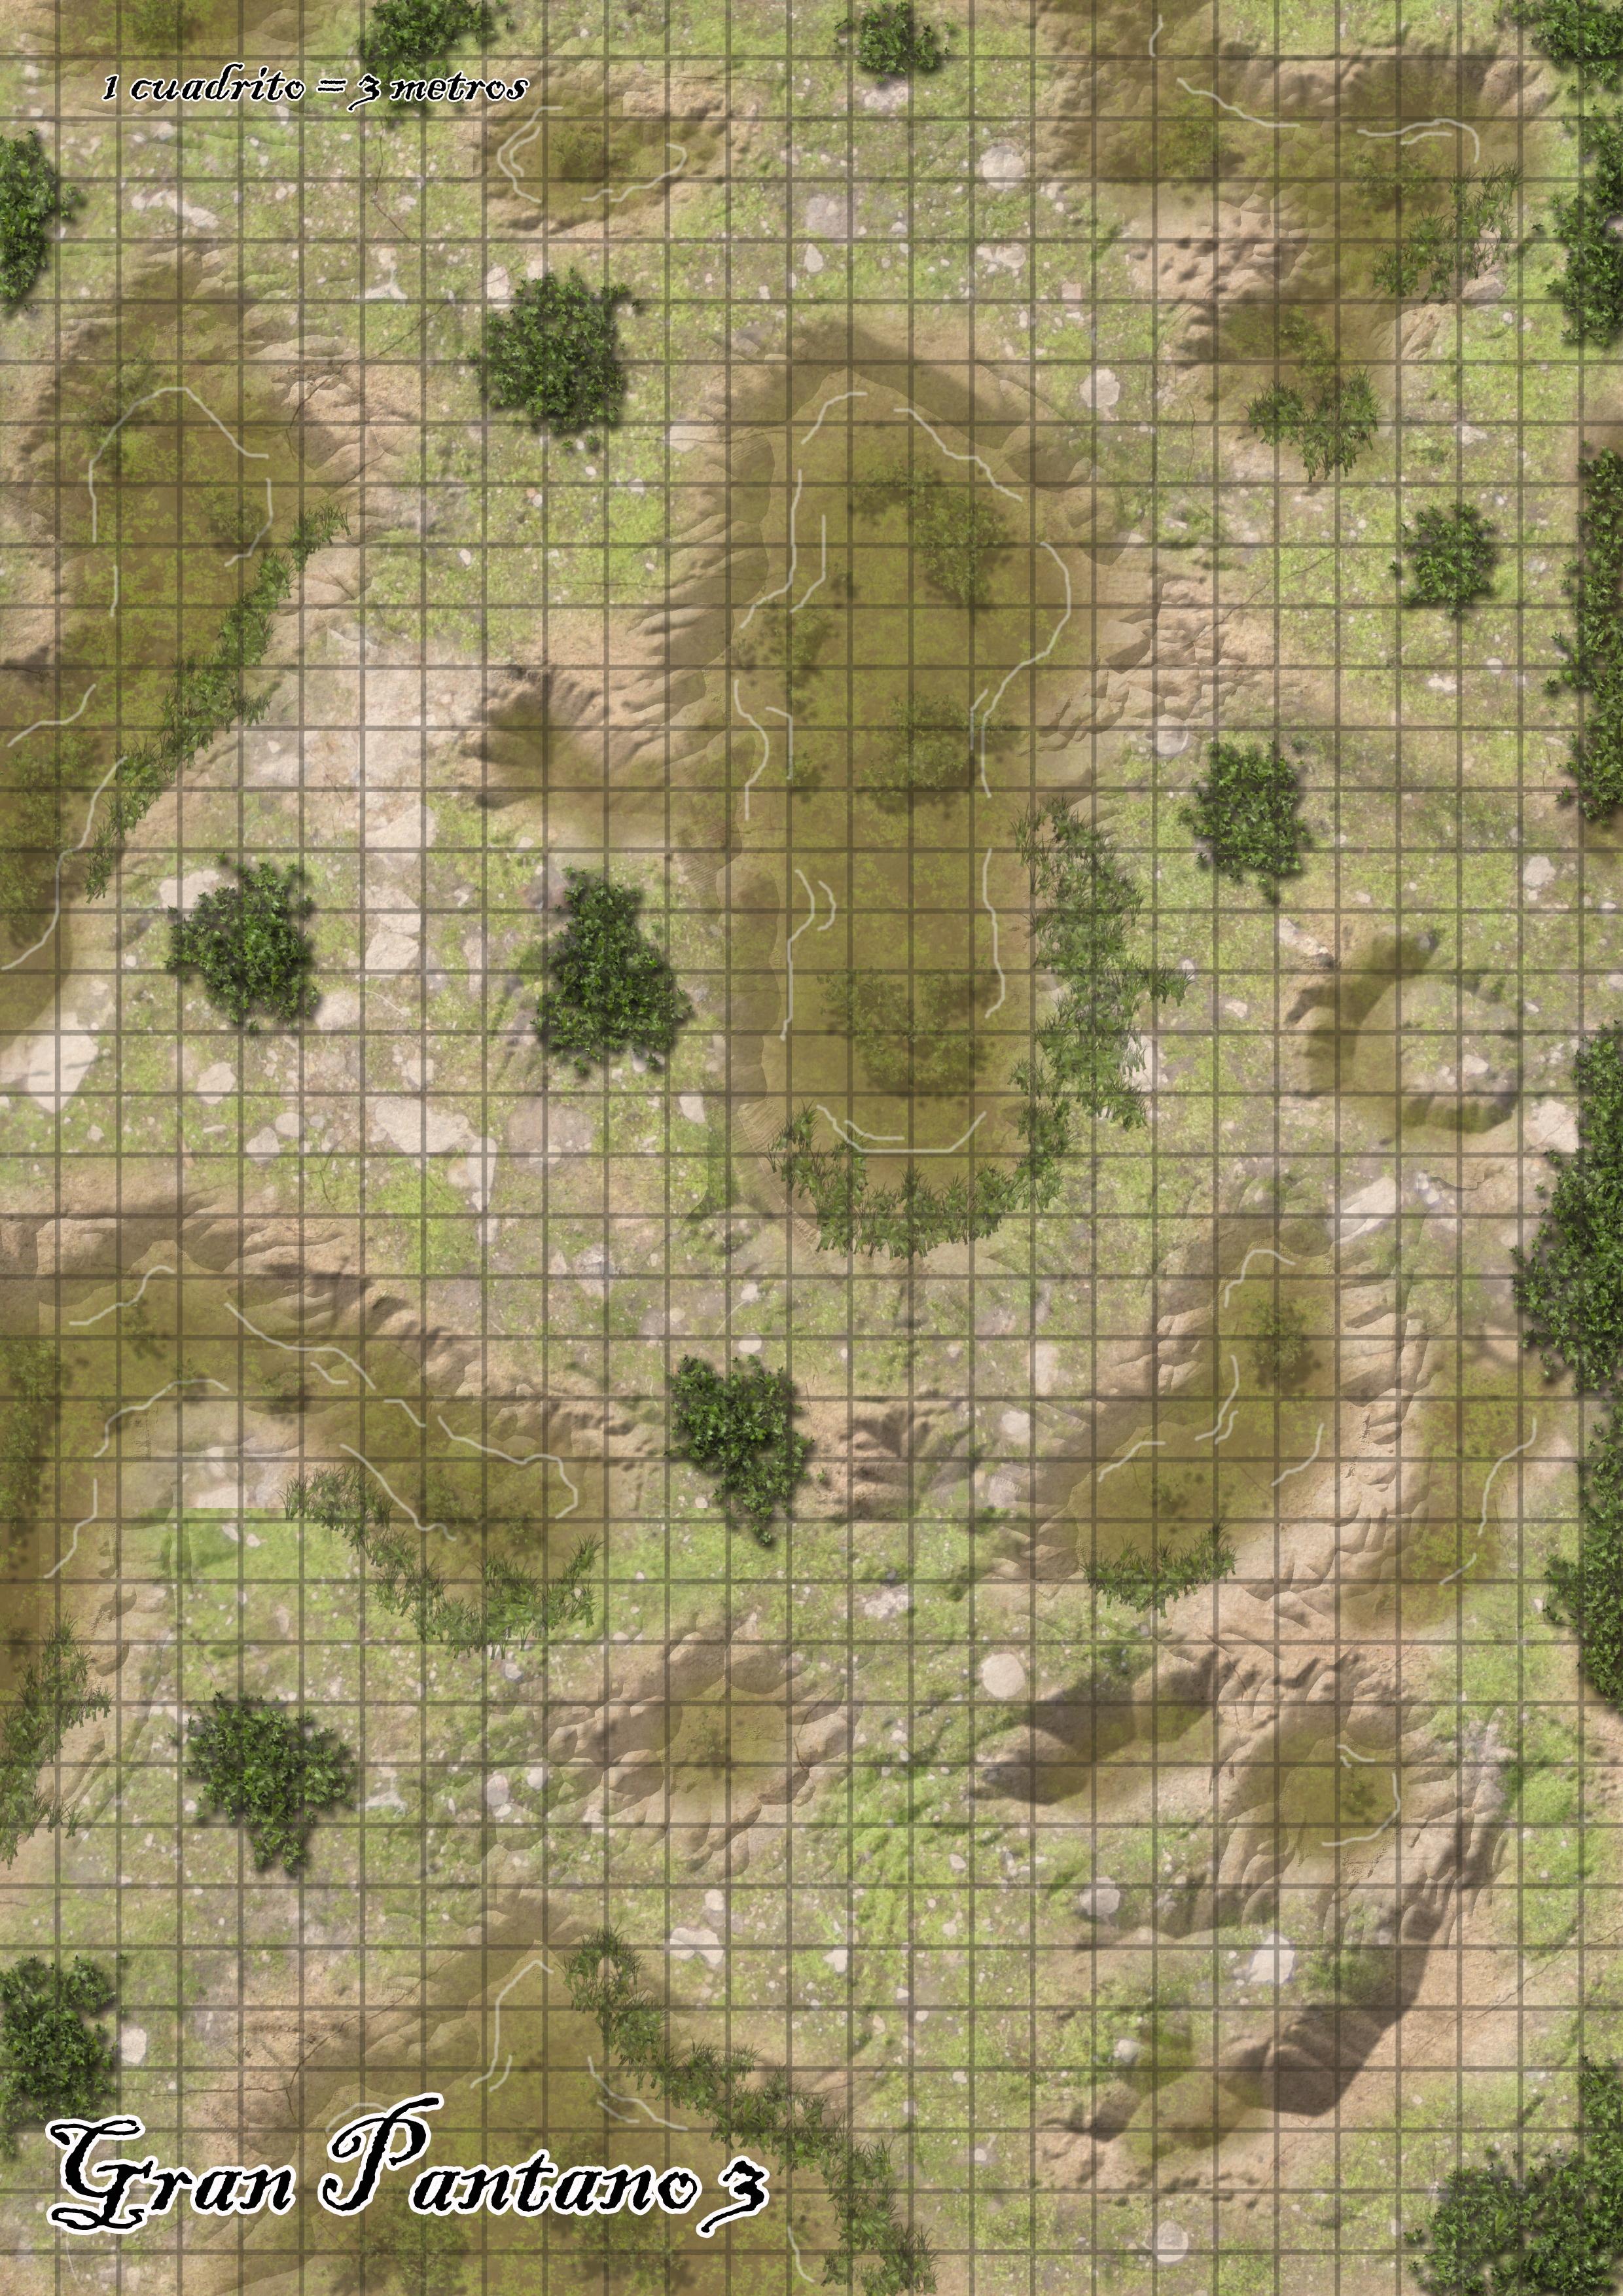 El Gran Pantano - Zona 3